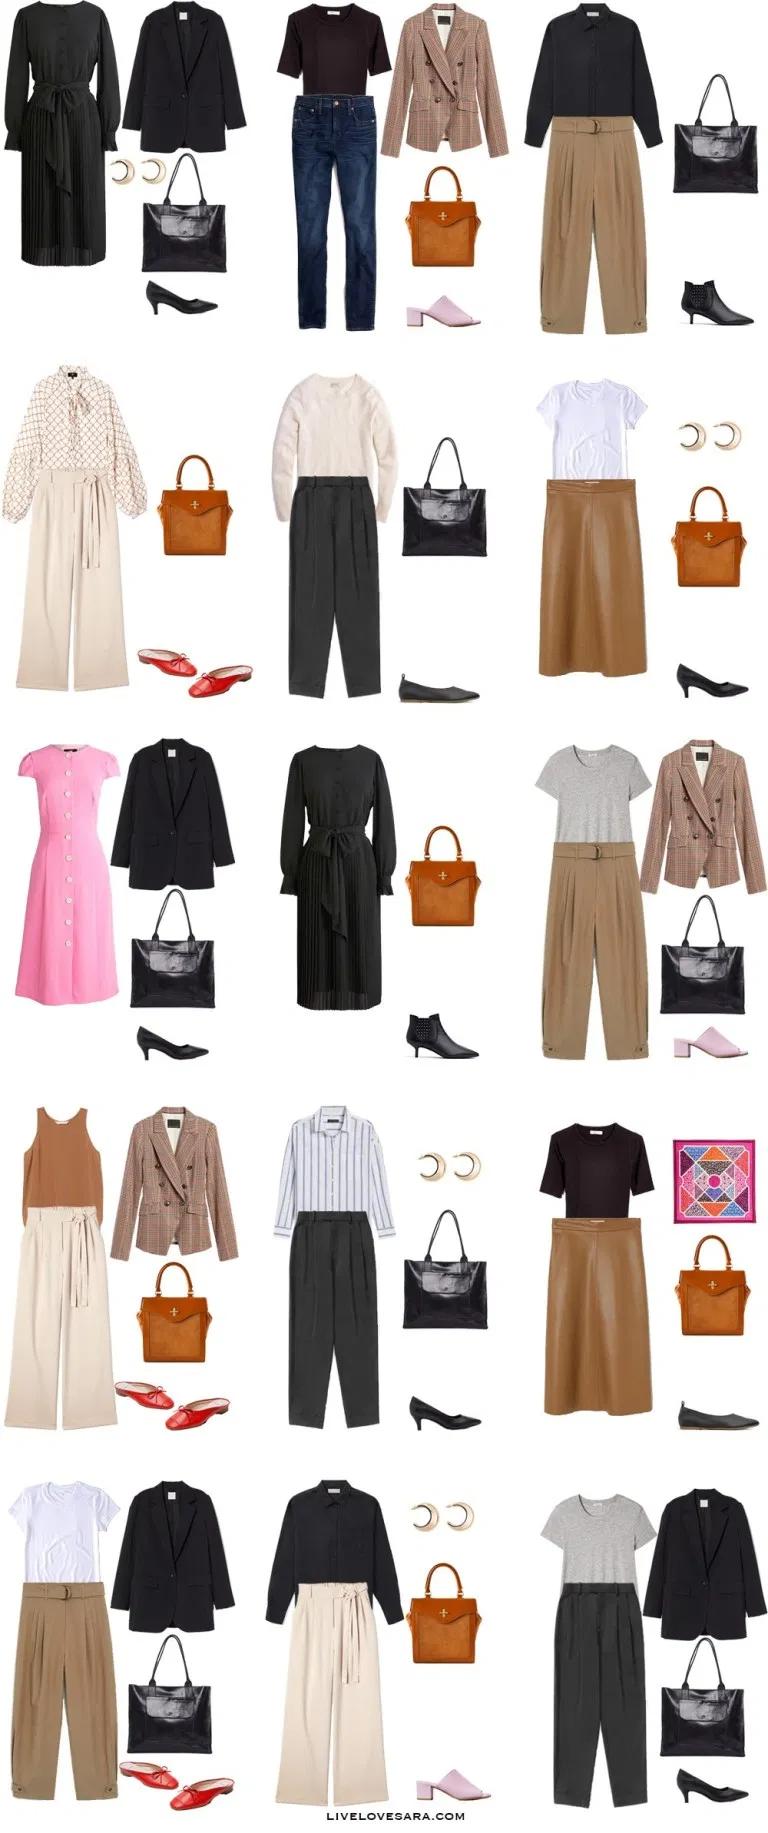 How to Build a Summer Work Capsule Wardrobe - livelovesara